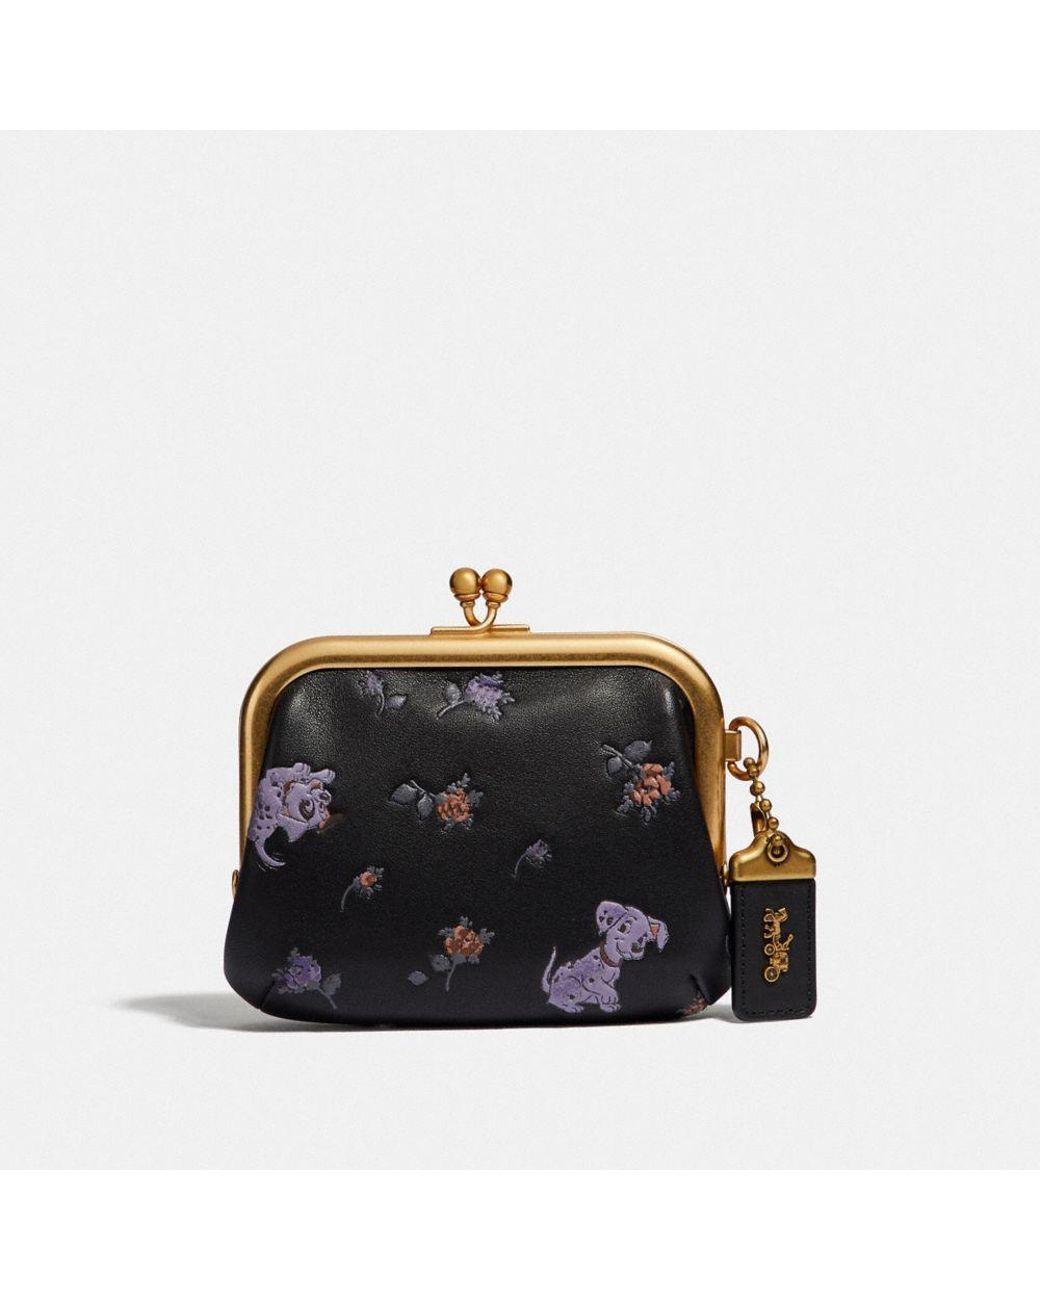 83b5f4e5b3d1 Lyst - COACH Disney X Kisslock Frame Pouch With Disney Motif in Black